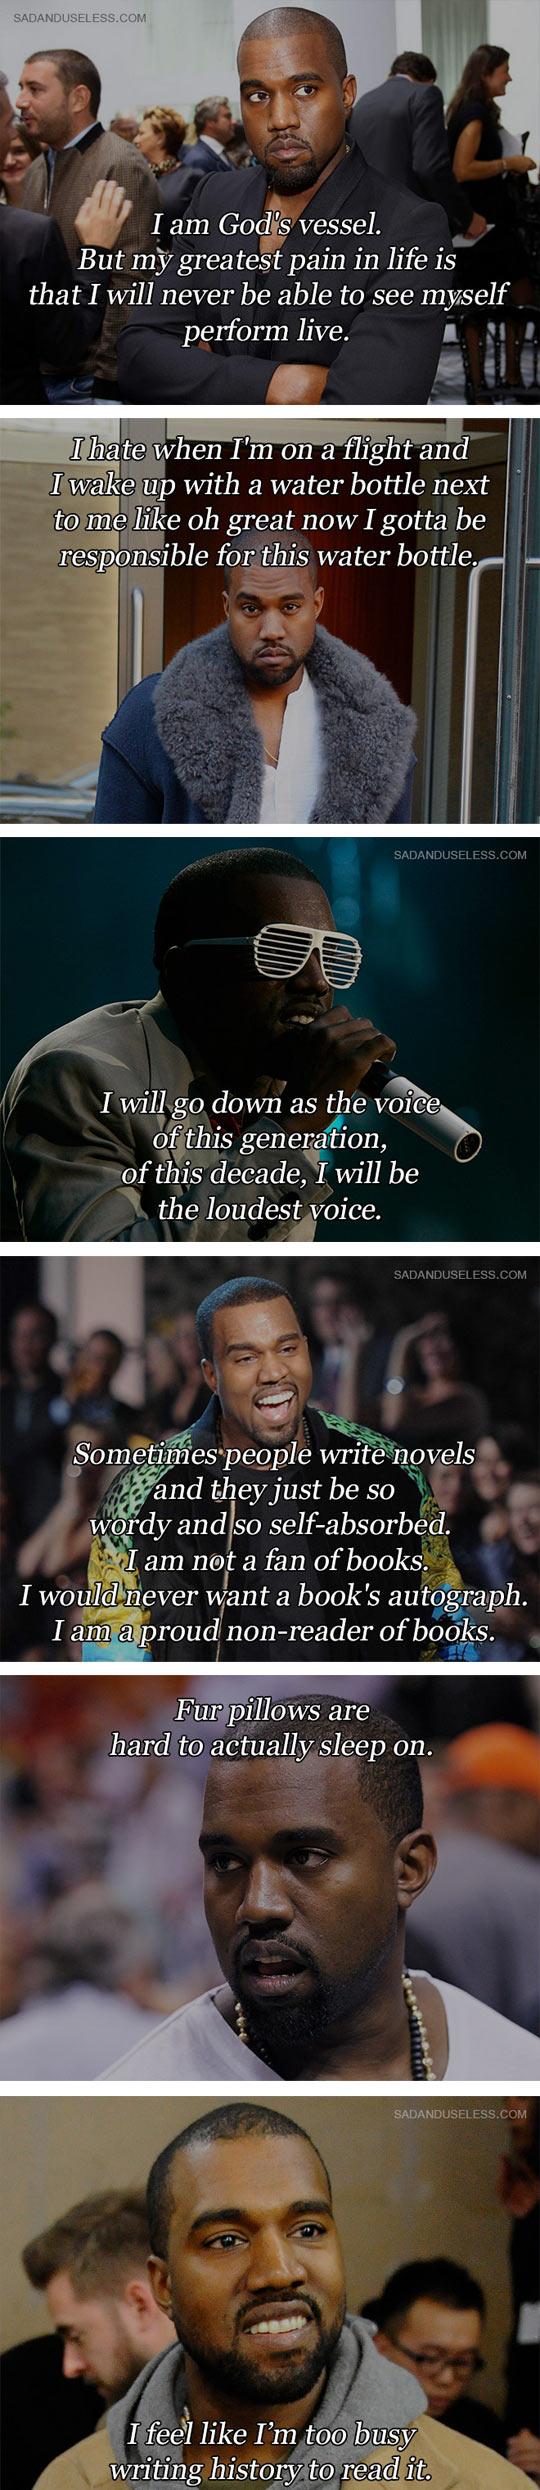 Some Kanye West Quotes Kanye West Quotes Kanye West Kanye